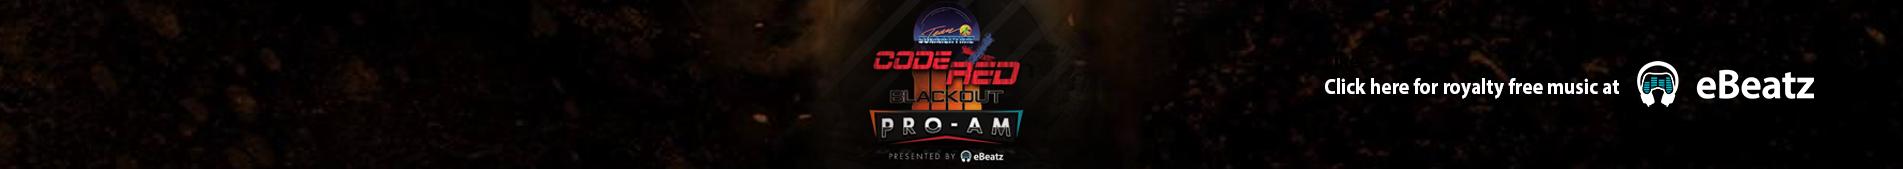 BOOM TV - Code Red Tournament